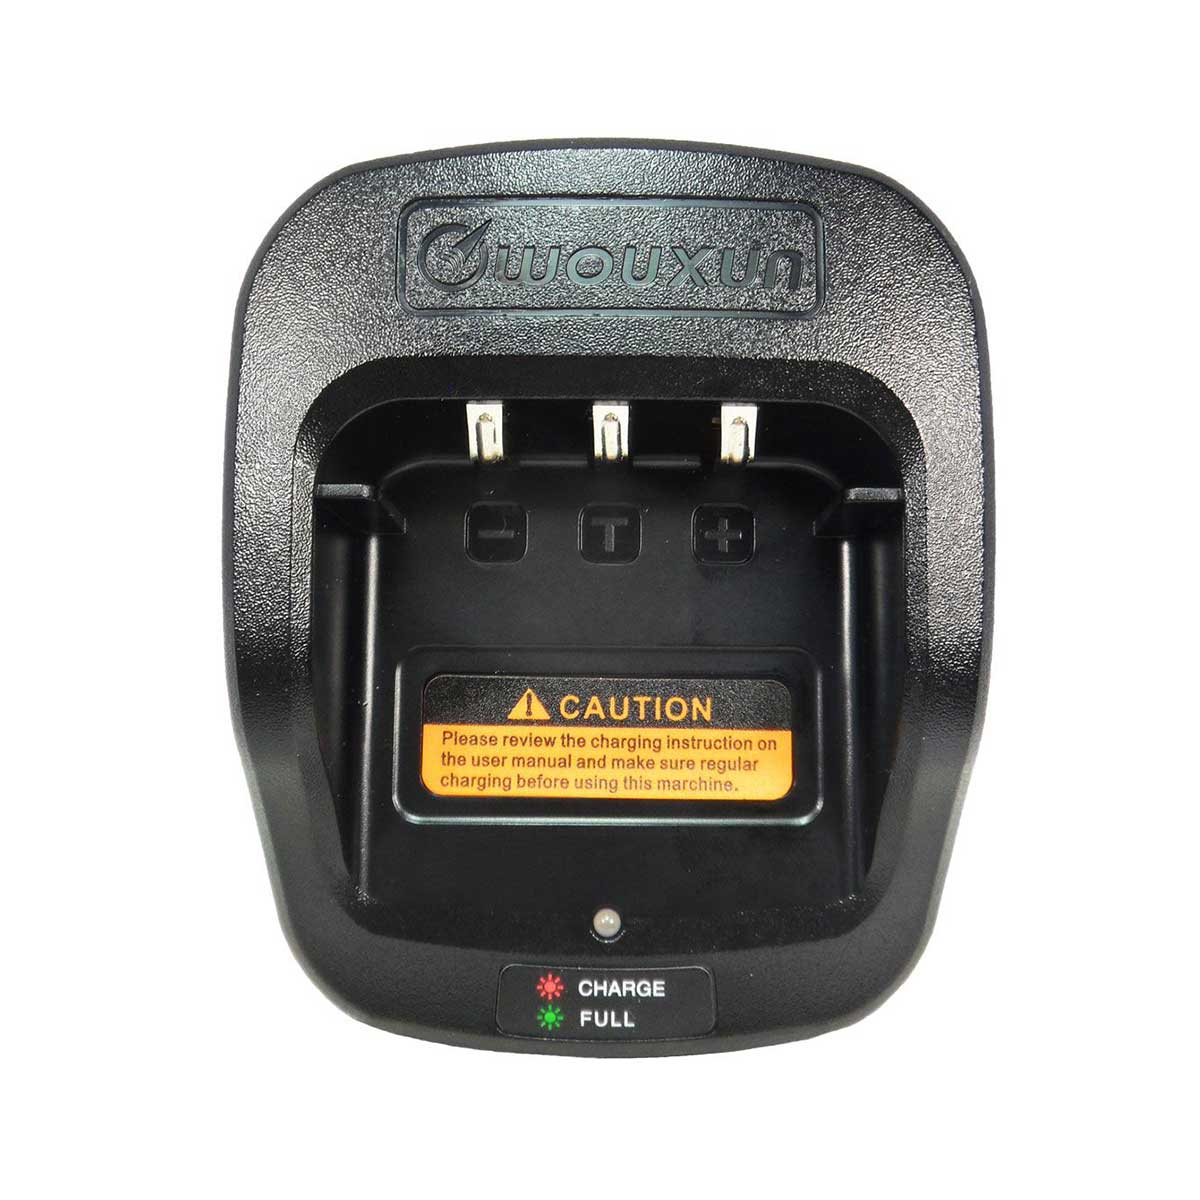 Cargador individual Wouxun CH-012 para radio ET-668/ Kg-988/ Kg-959